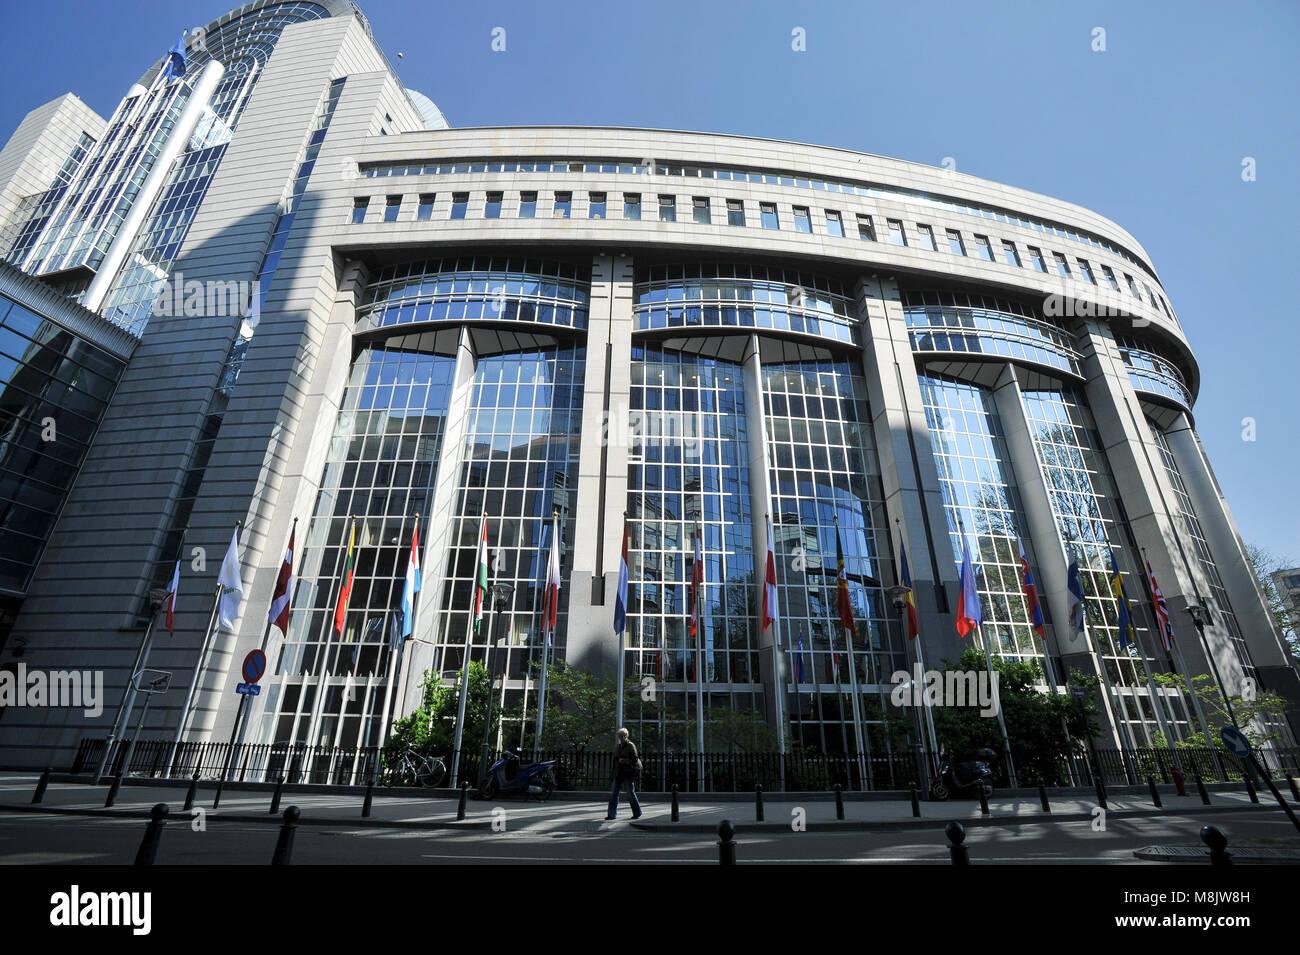 Paul-Henri Spaak building of the European Parliament seat in Espace Leopold / Leopoldruimte in European Quarter - Stock Image